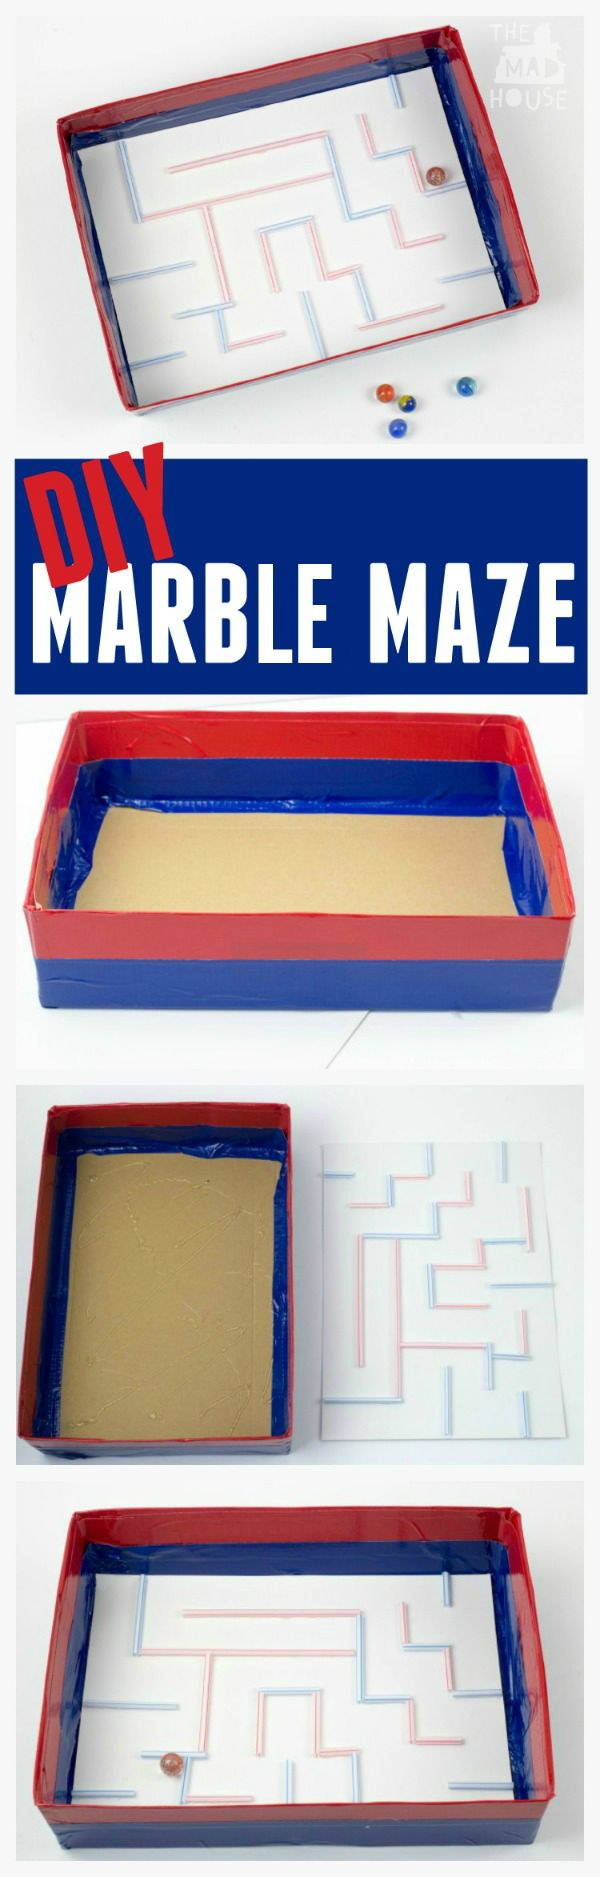 Fidget bracelet with built in marble maze by dejong dream house - Diy Marble Maze